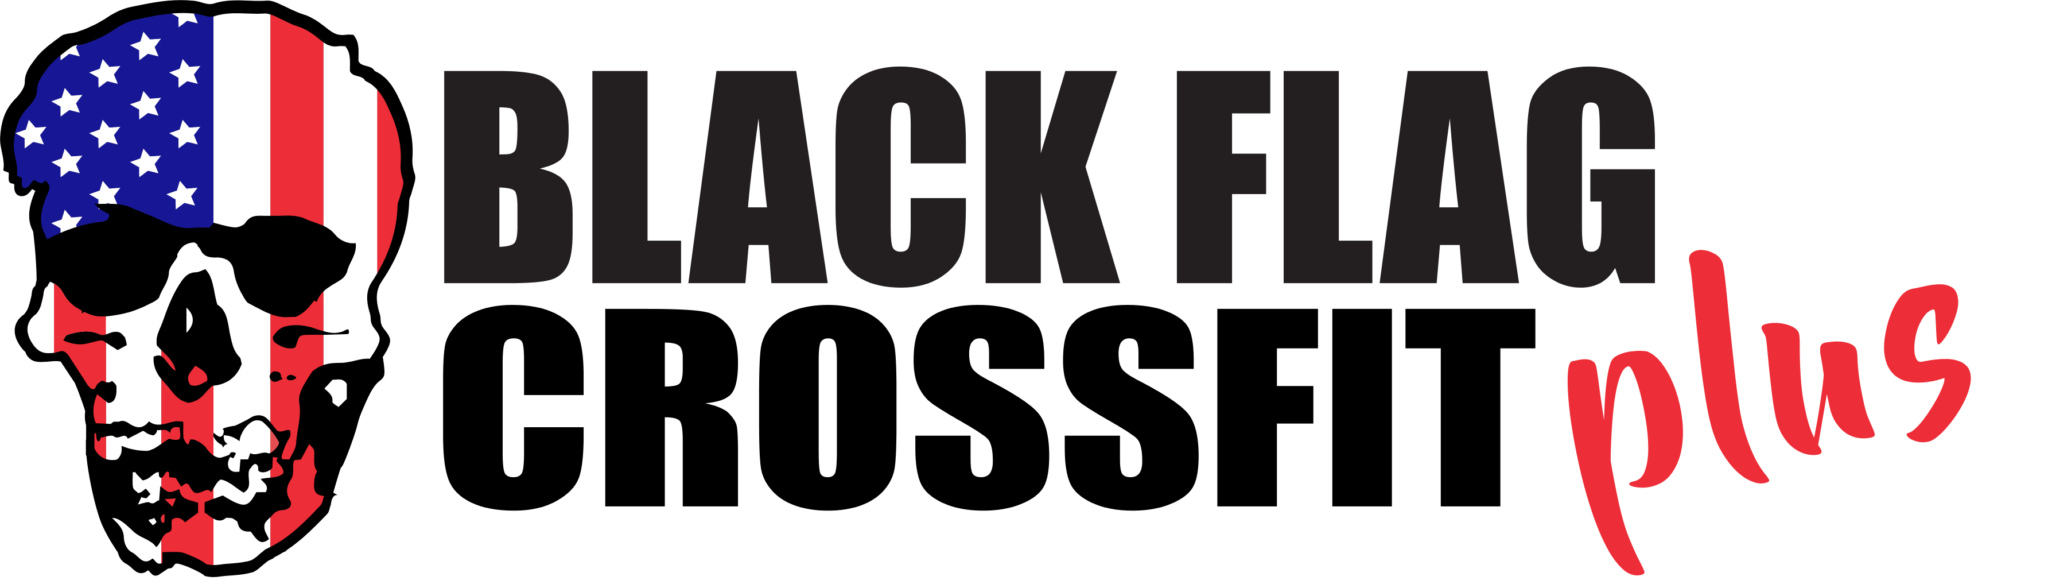 Black Flag Plus